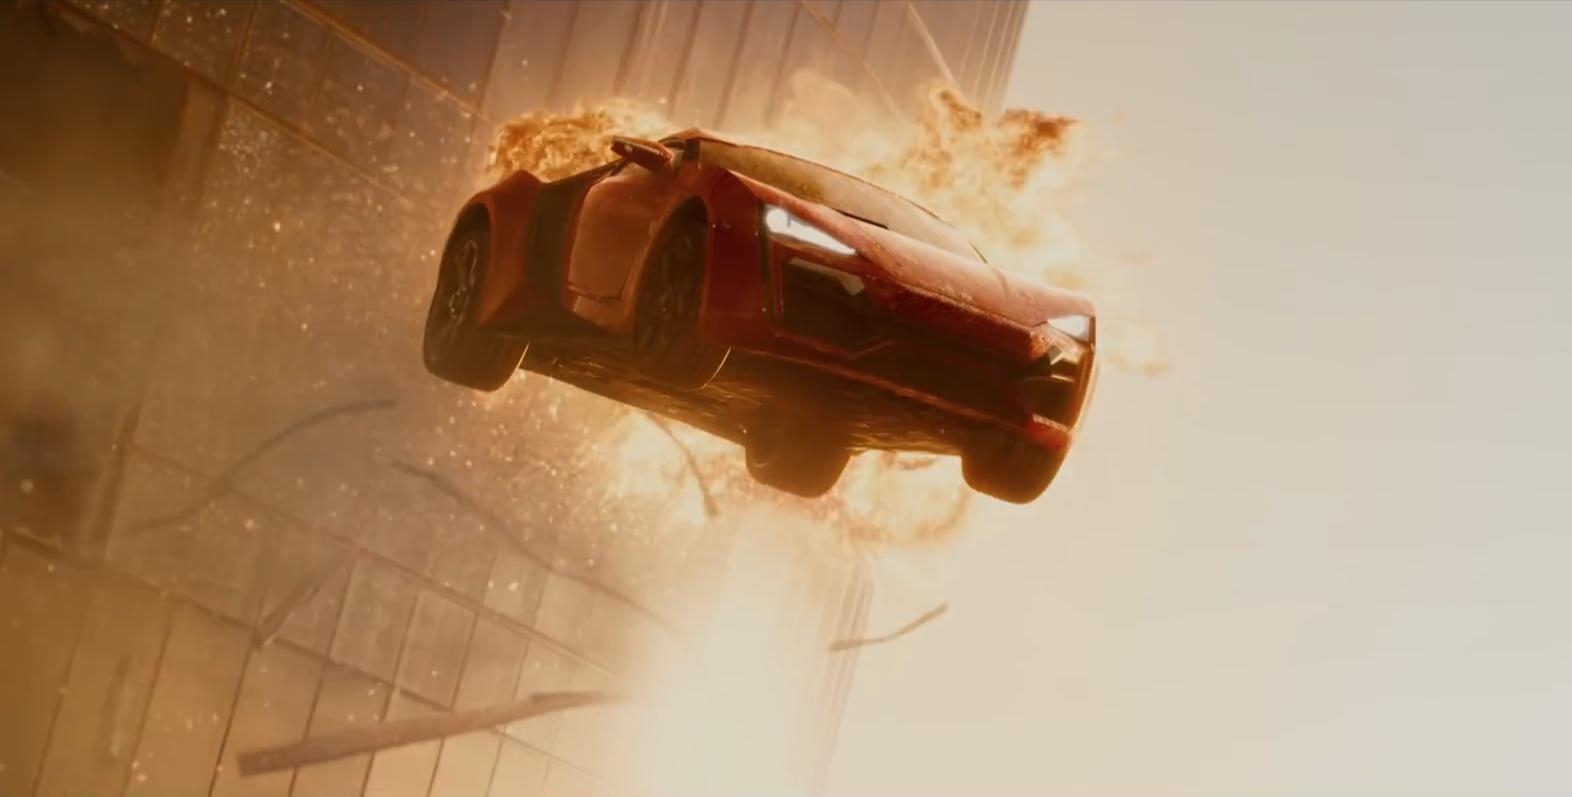 Lykan Hypersport Skyscraper Jump from Furious 7 Is